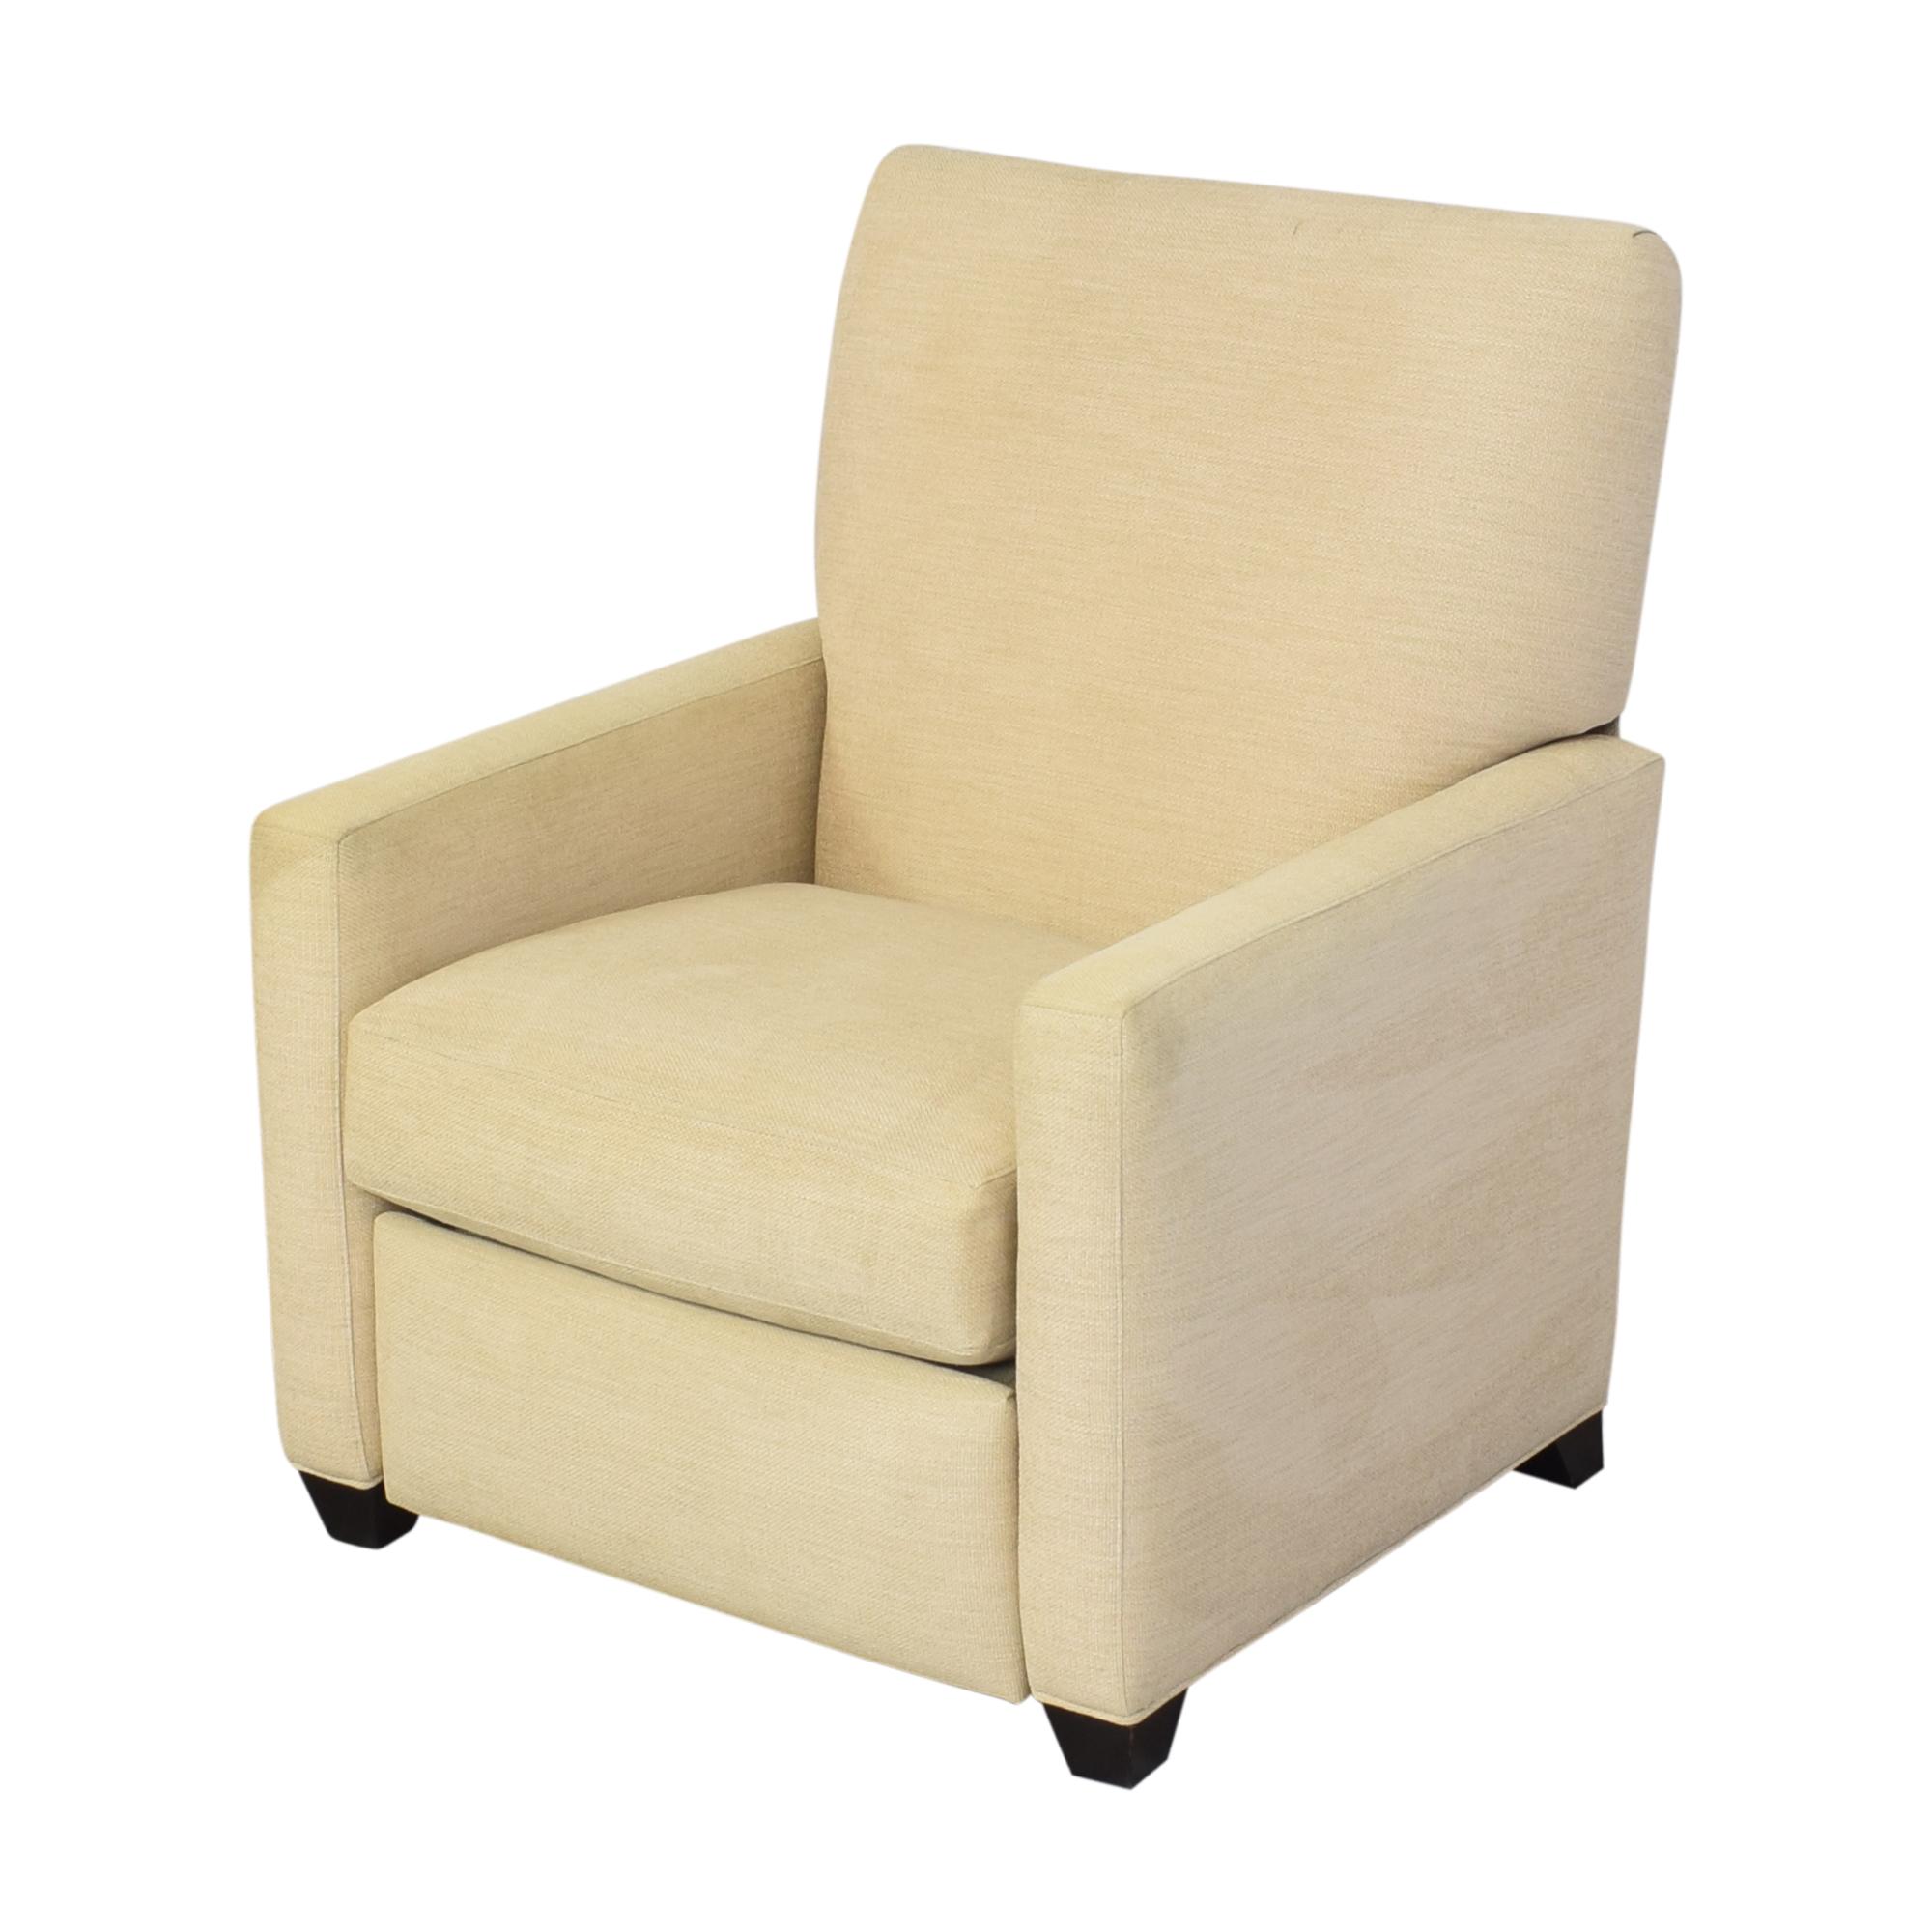 Crate & Barrel Recliner / Chairs